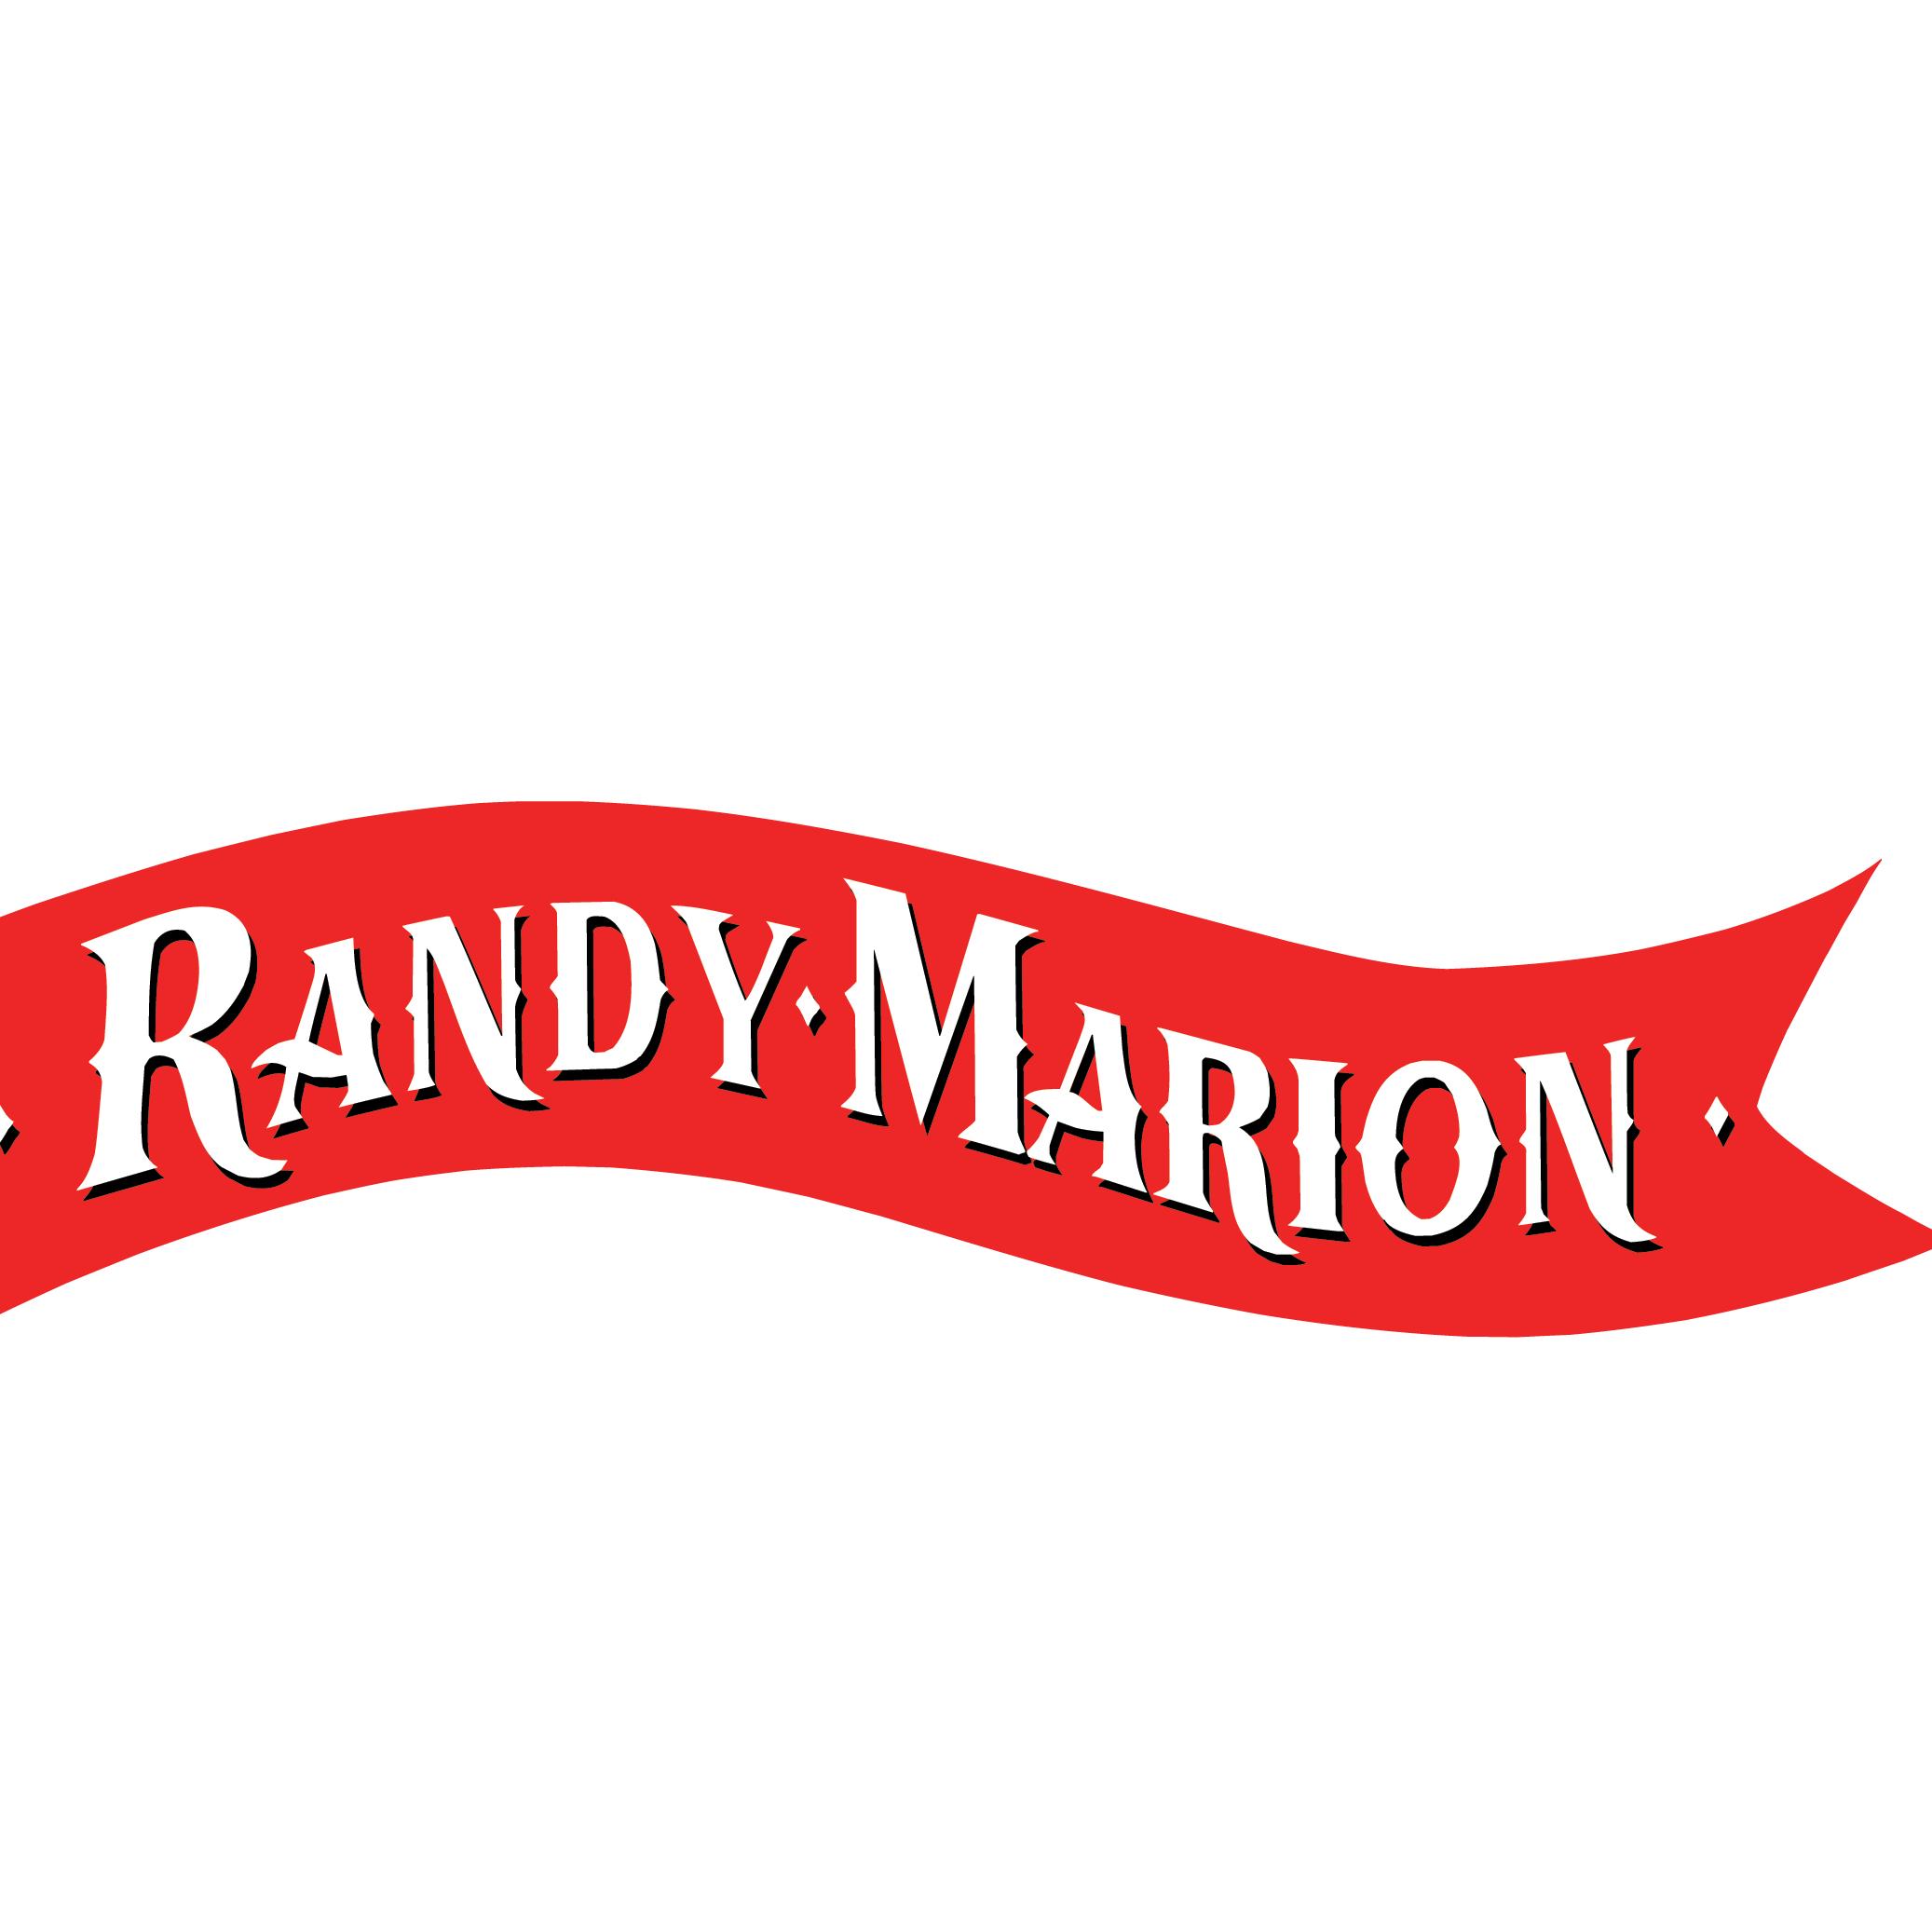 Randy Marion Buick GMC Truck